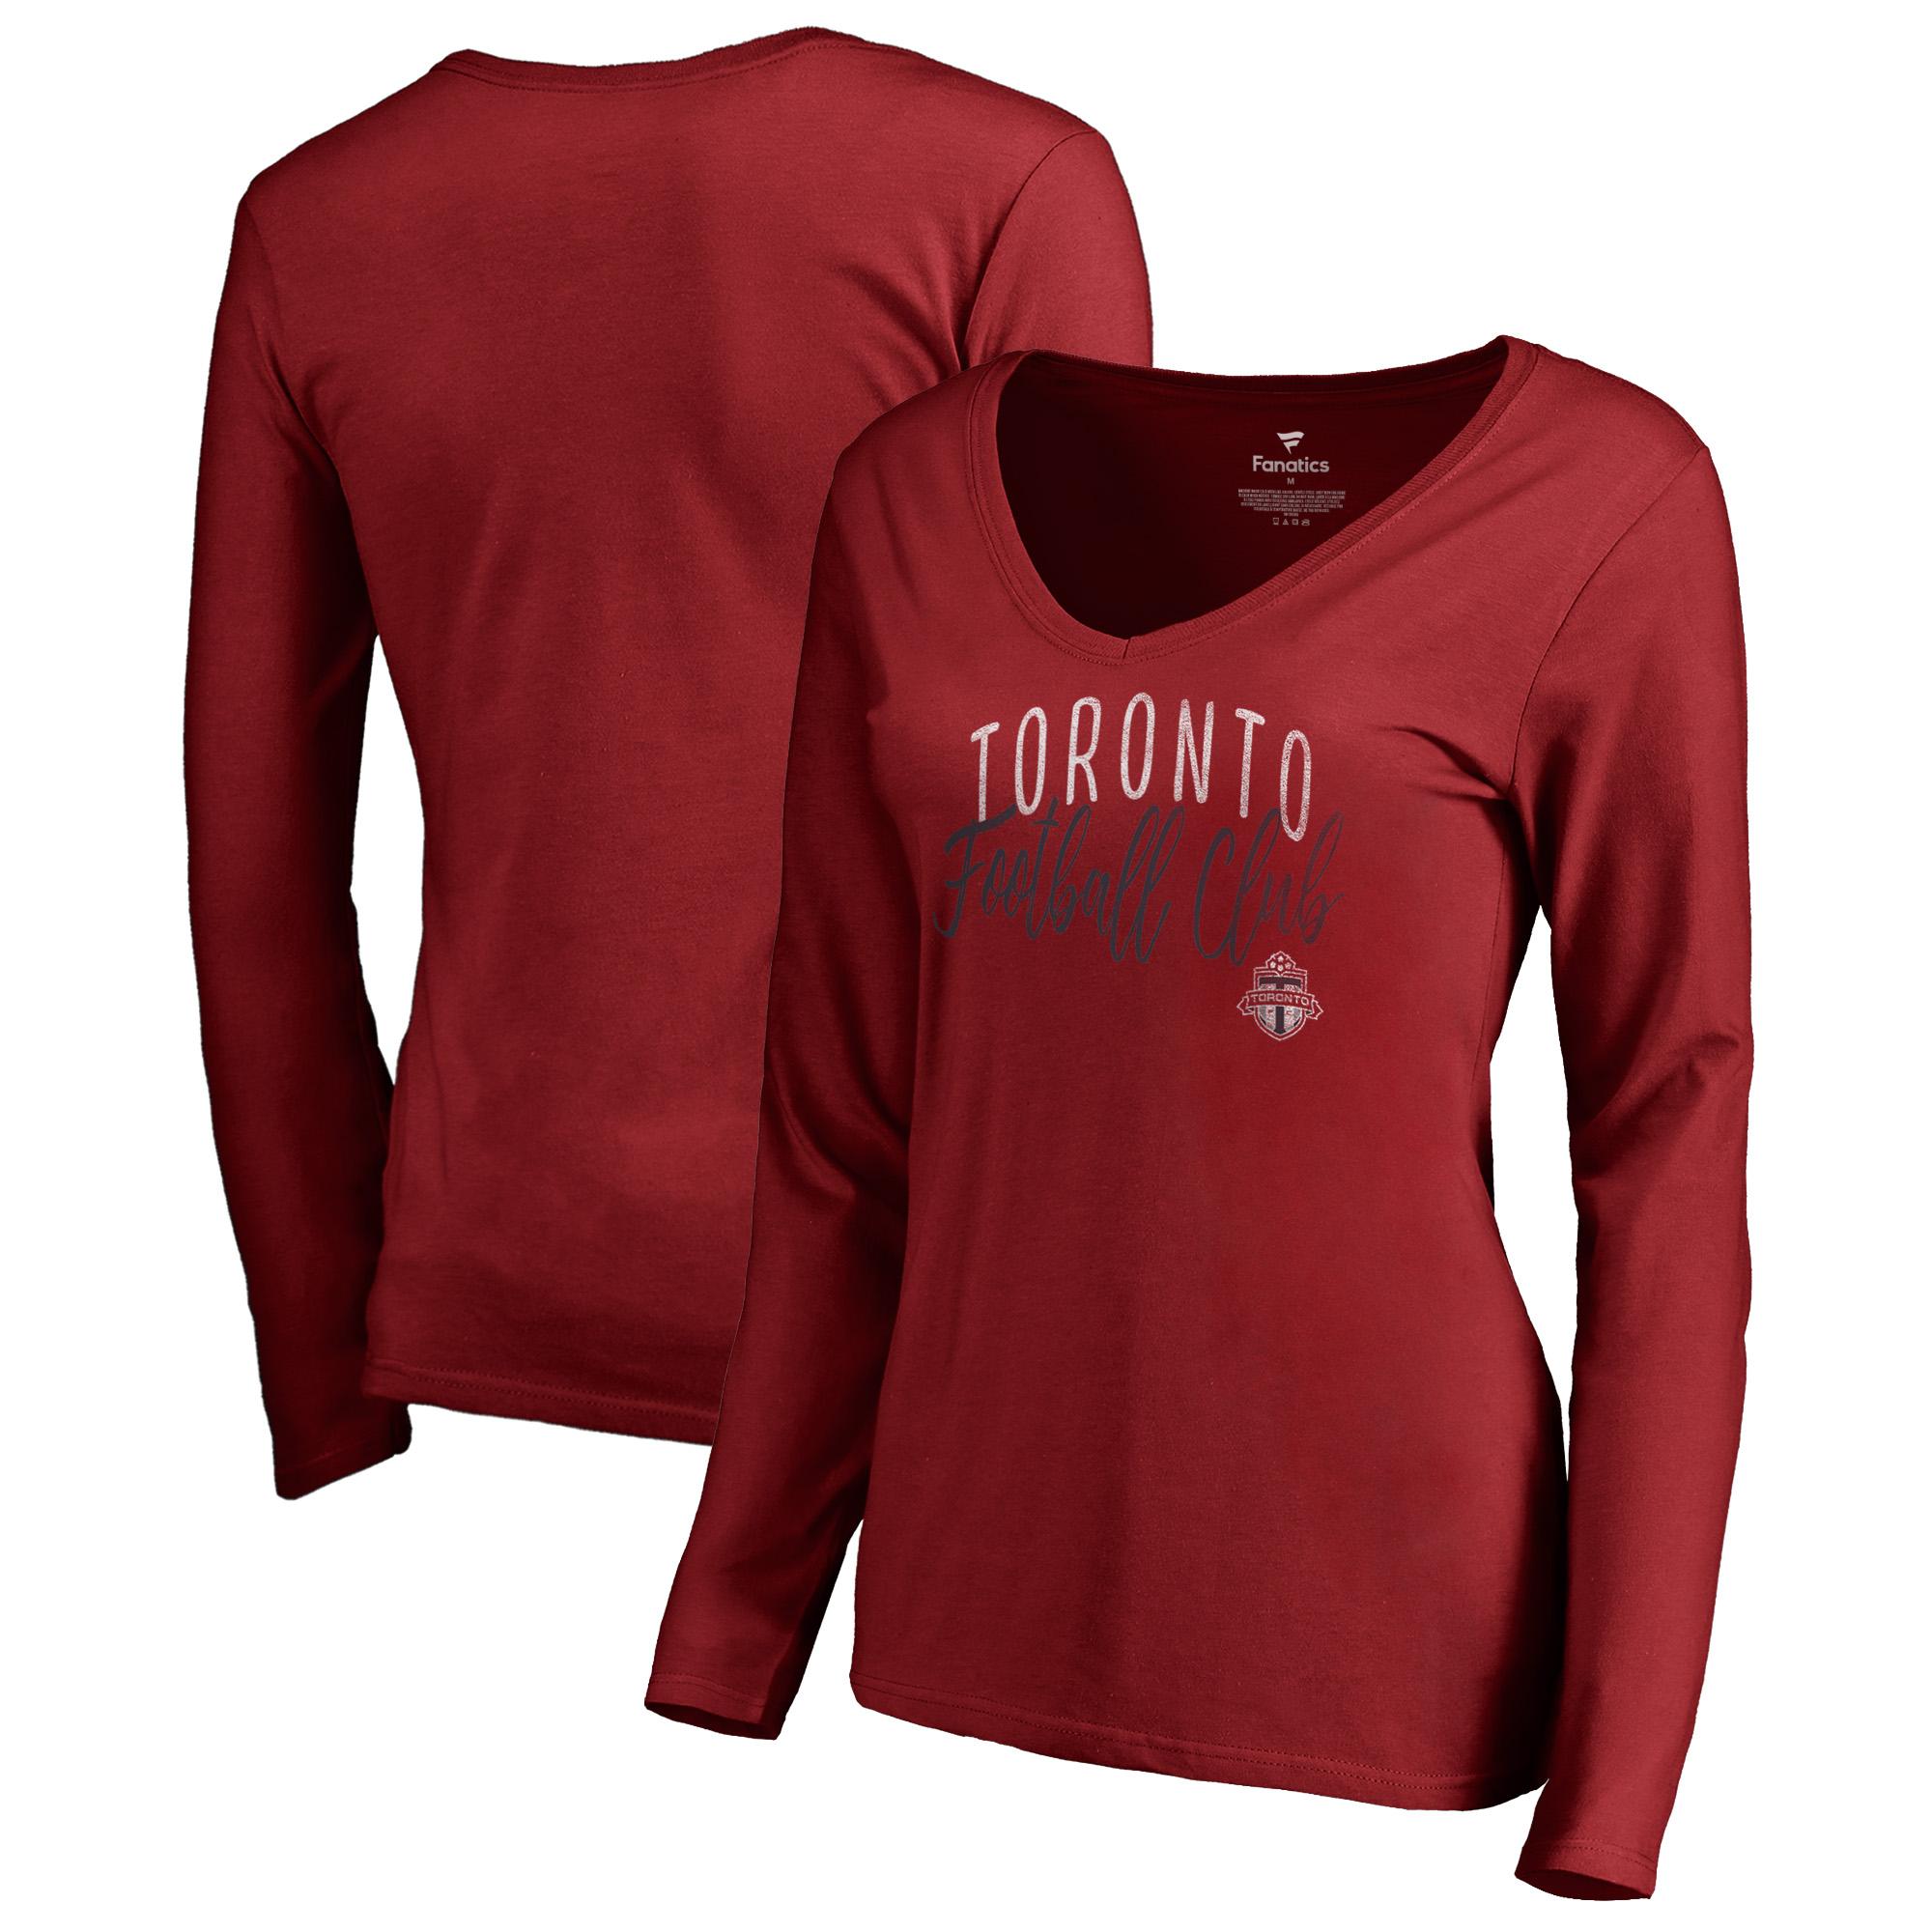 Toronto FC Fanatics Branded Women's Graceful V-Neck Long Sleeve T-Shirt - Red